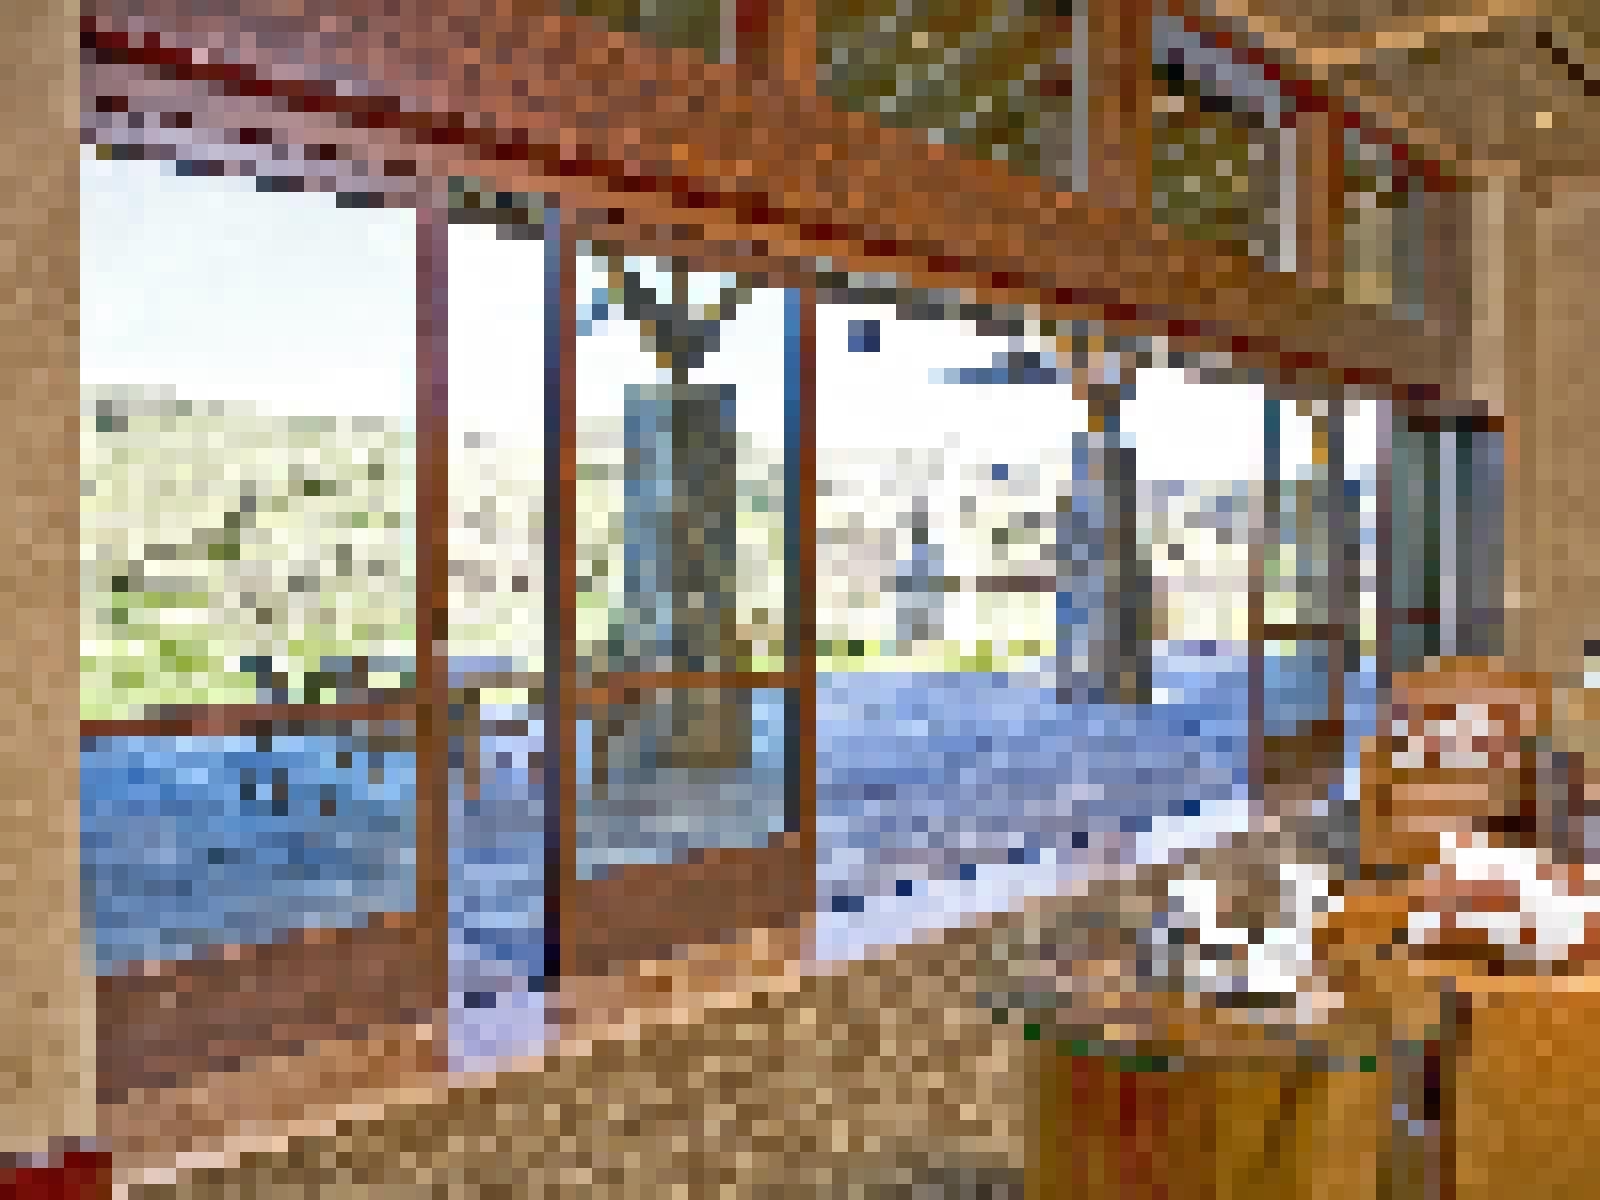 Wood FramedSlidingGlass Walls-Highlights